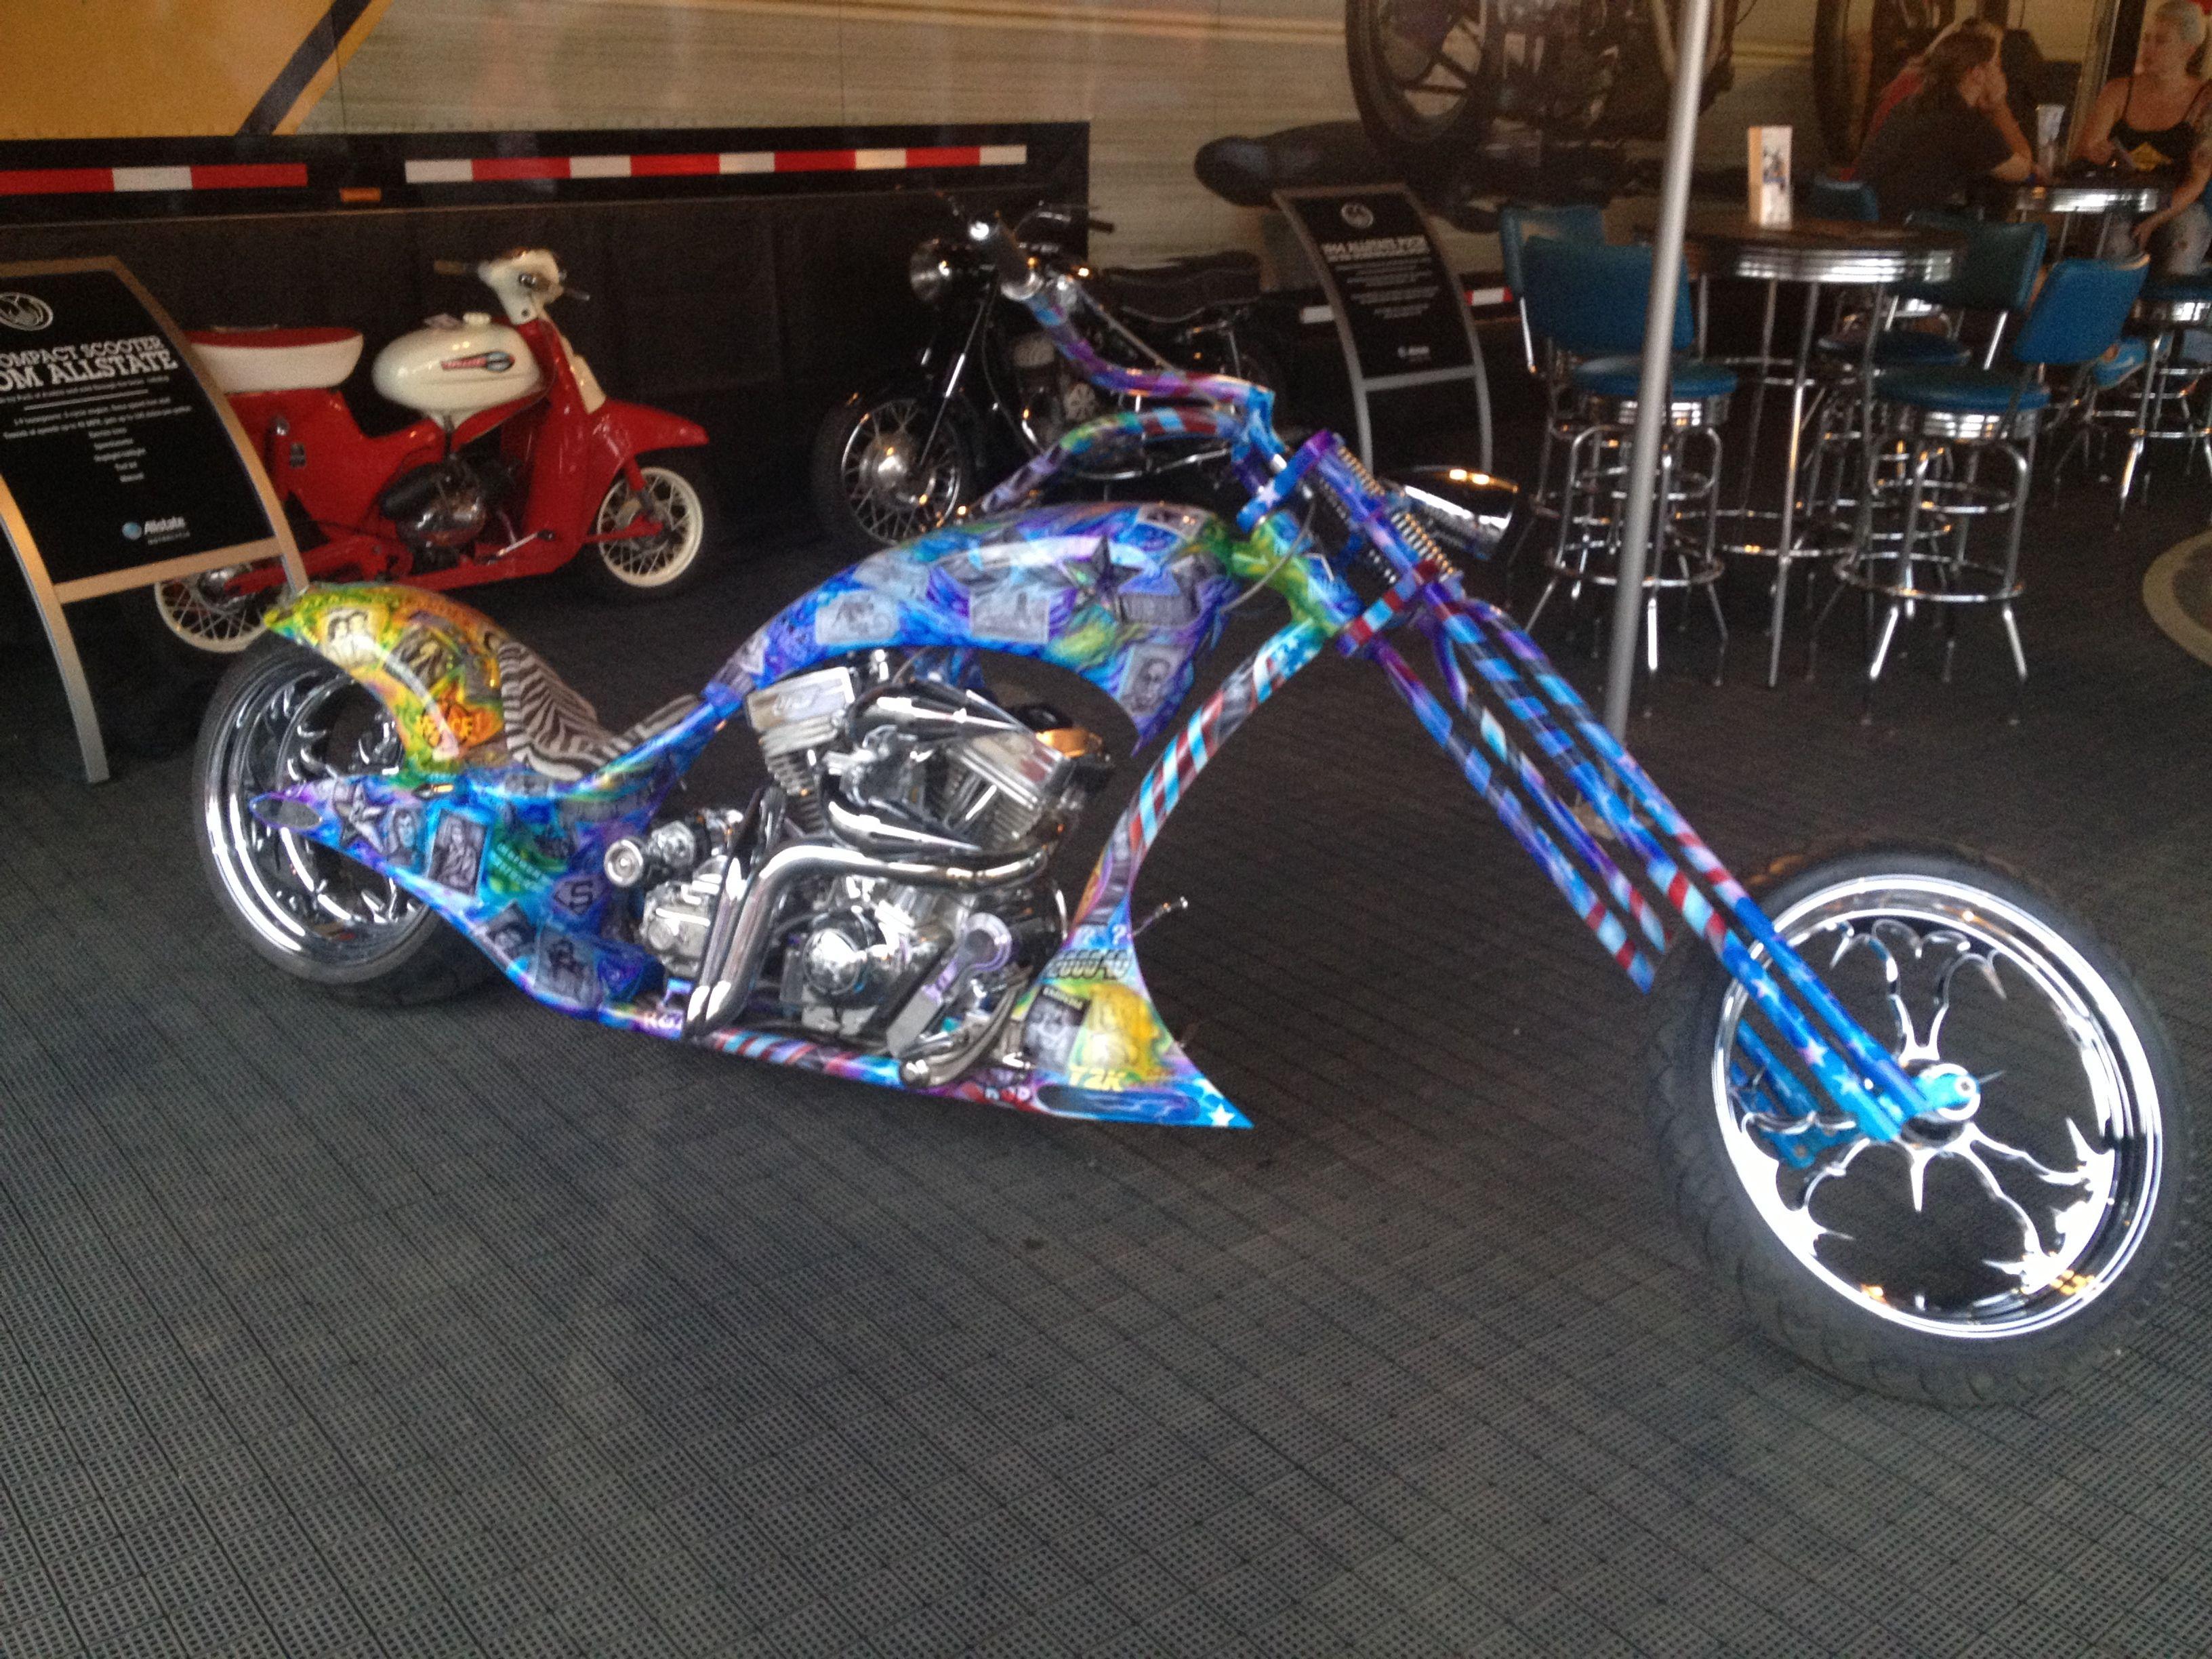 Arlen Ness bike